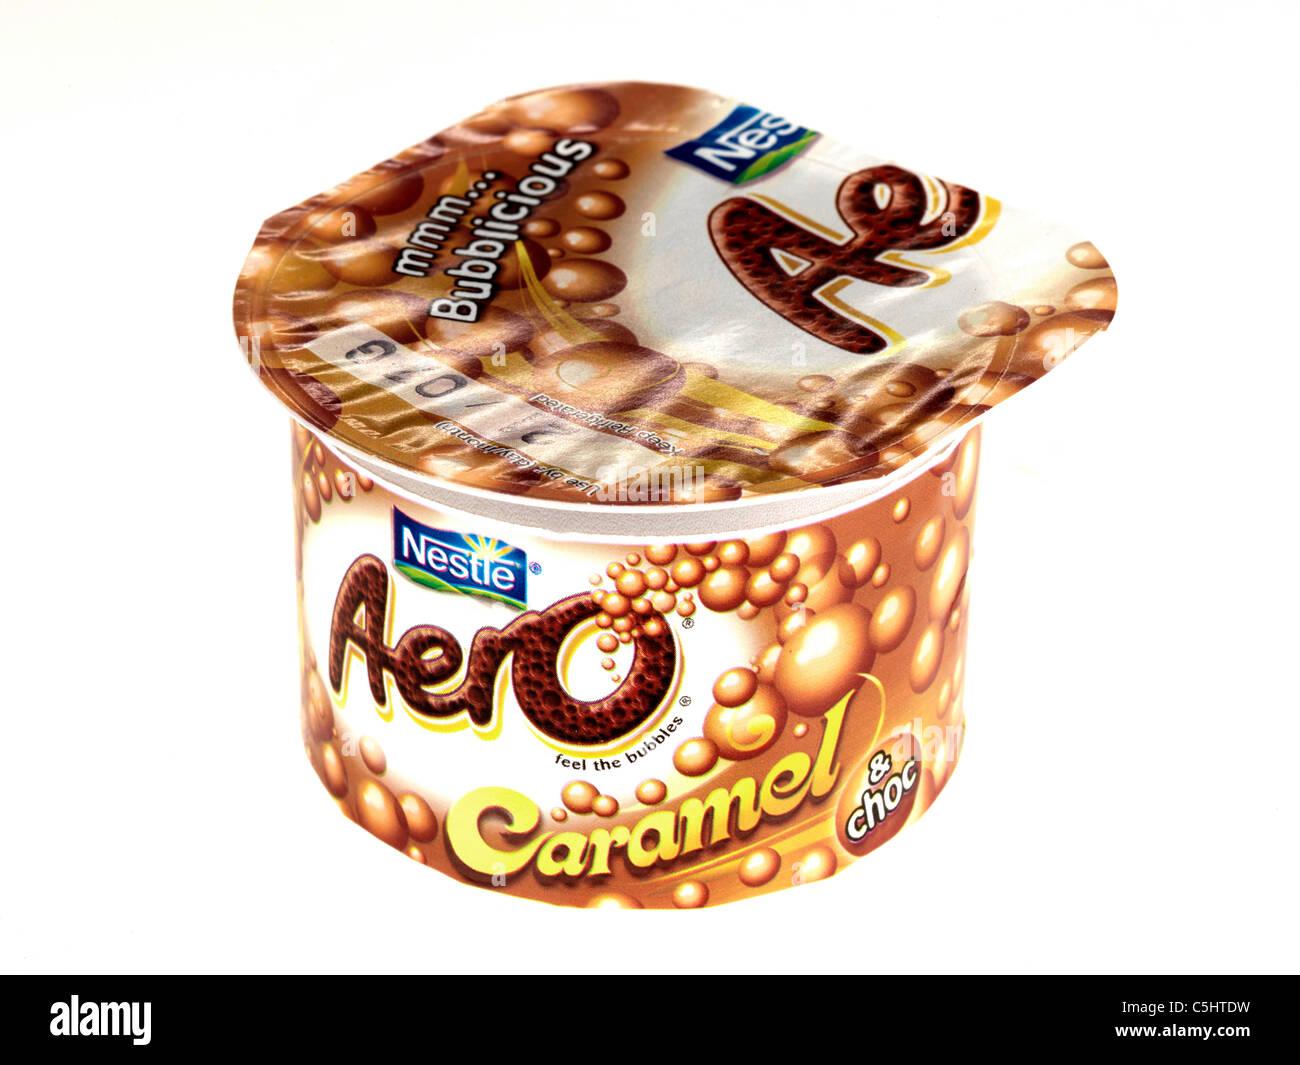 Aero Caramel Chocolate Desserts - Stock Image